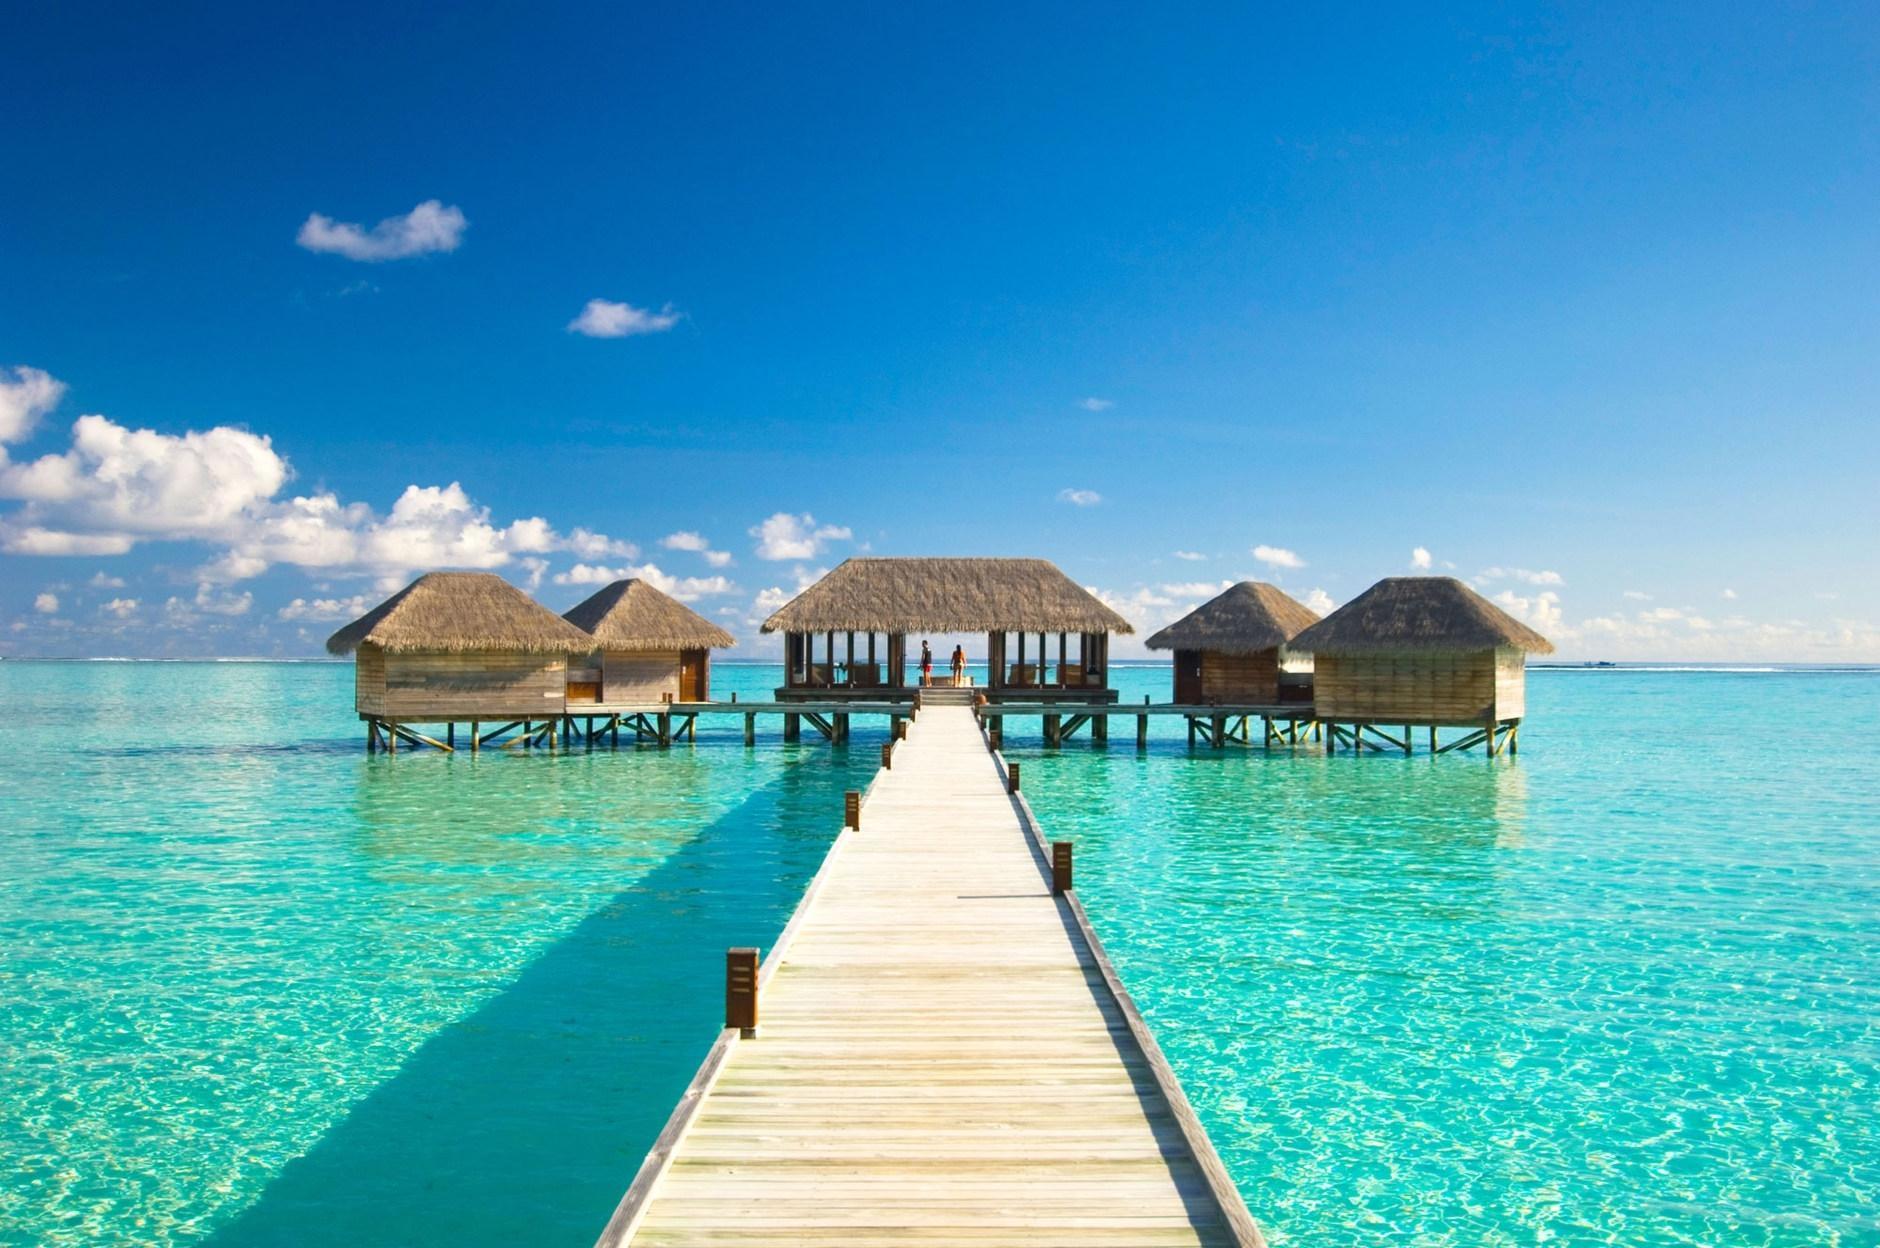 Vols A/R Madrid <-> Maldive uniquement en Novembre/Décembre 2016